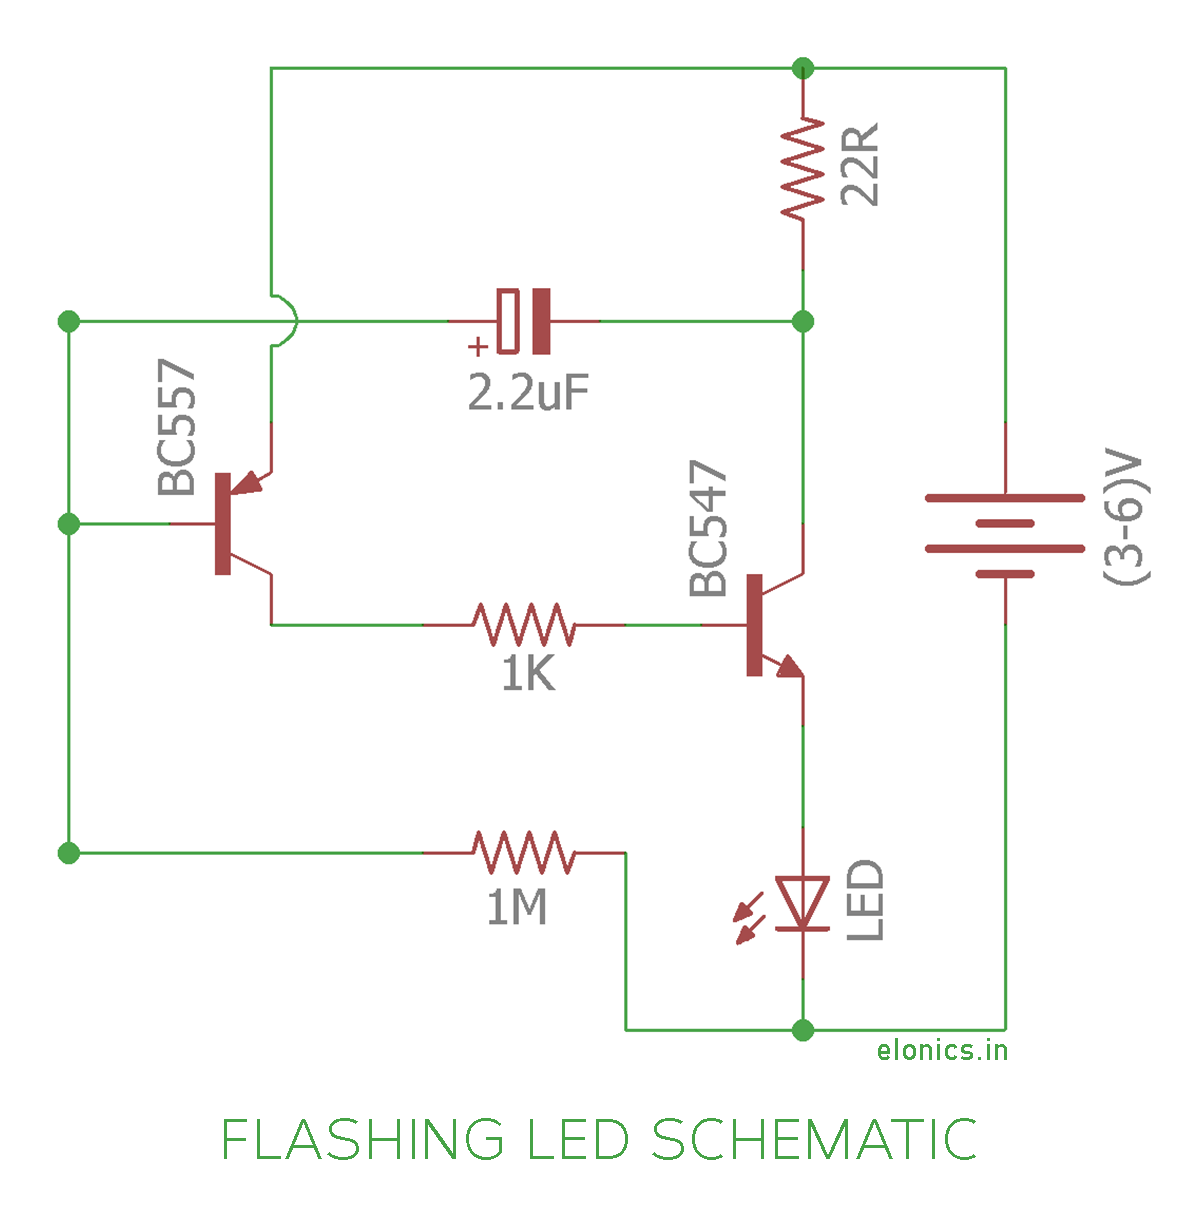 flashing blinking led circuit using transistors schematic [ 1200 x 1225 Pixel ]